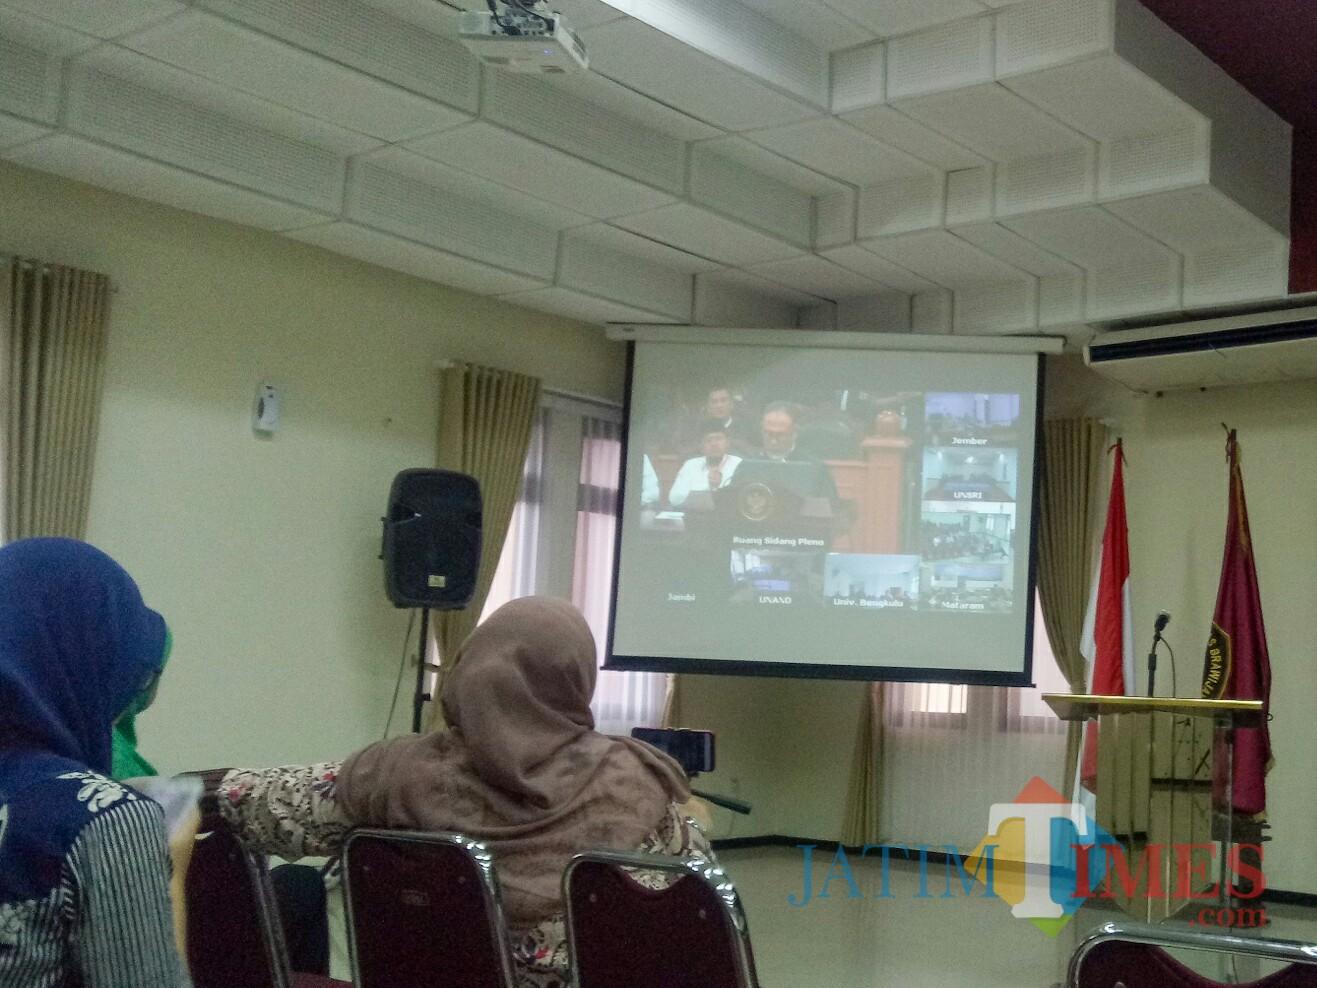 Ketua tim hukum Prabowo-Sandi, Bambang Widjojanto saat membacakan permohonan di sidang PHPU. (Foto: Imarotul Izzah/MalangTIMES)